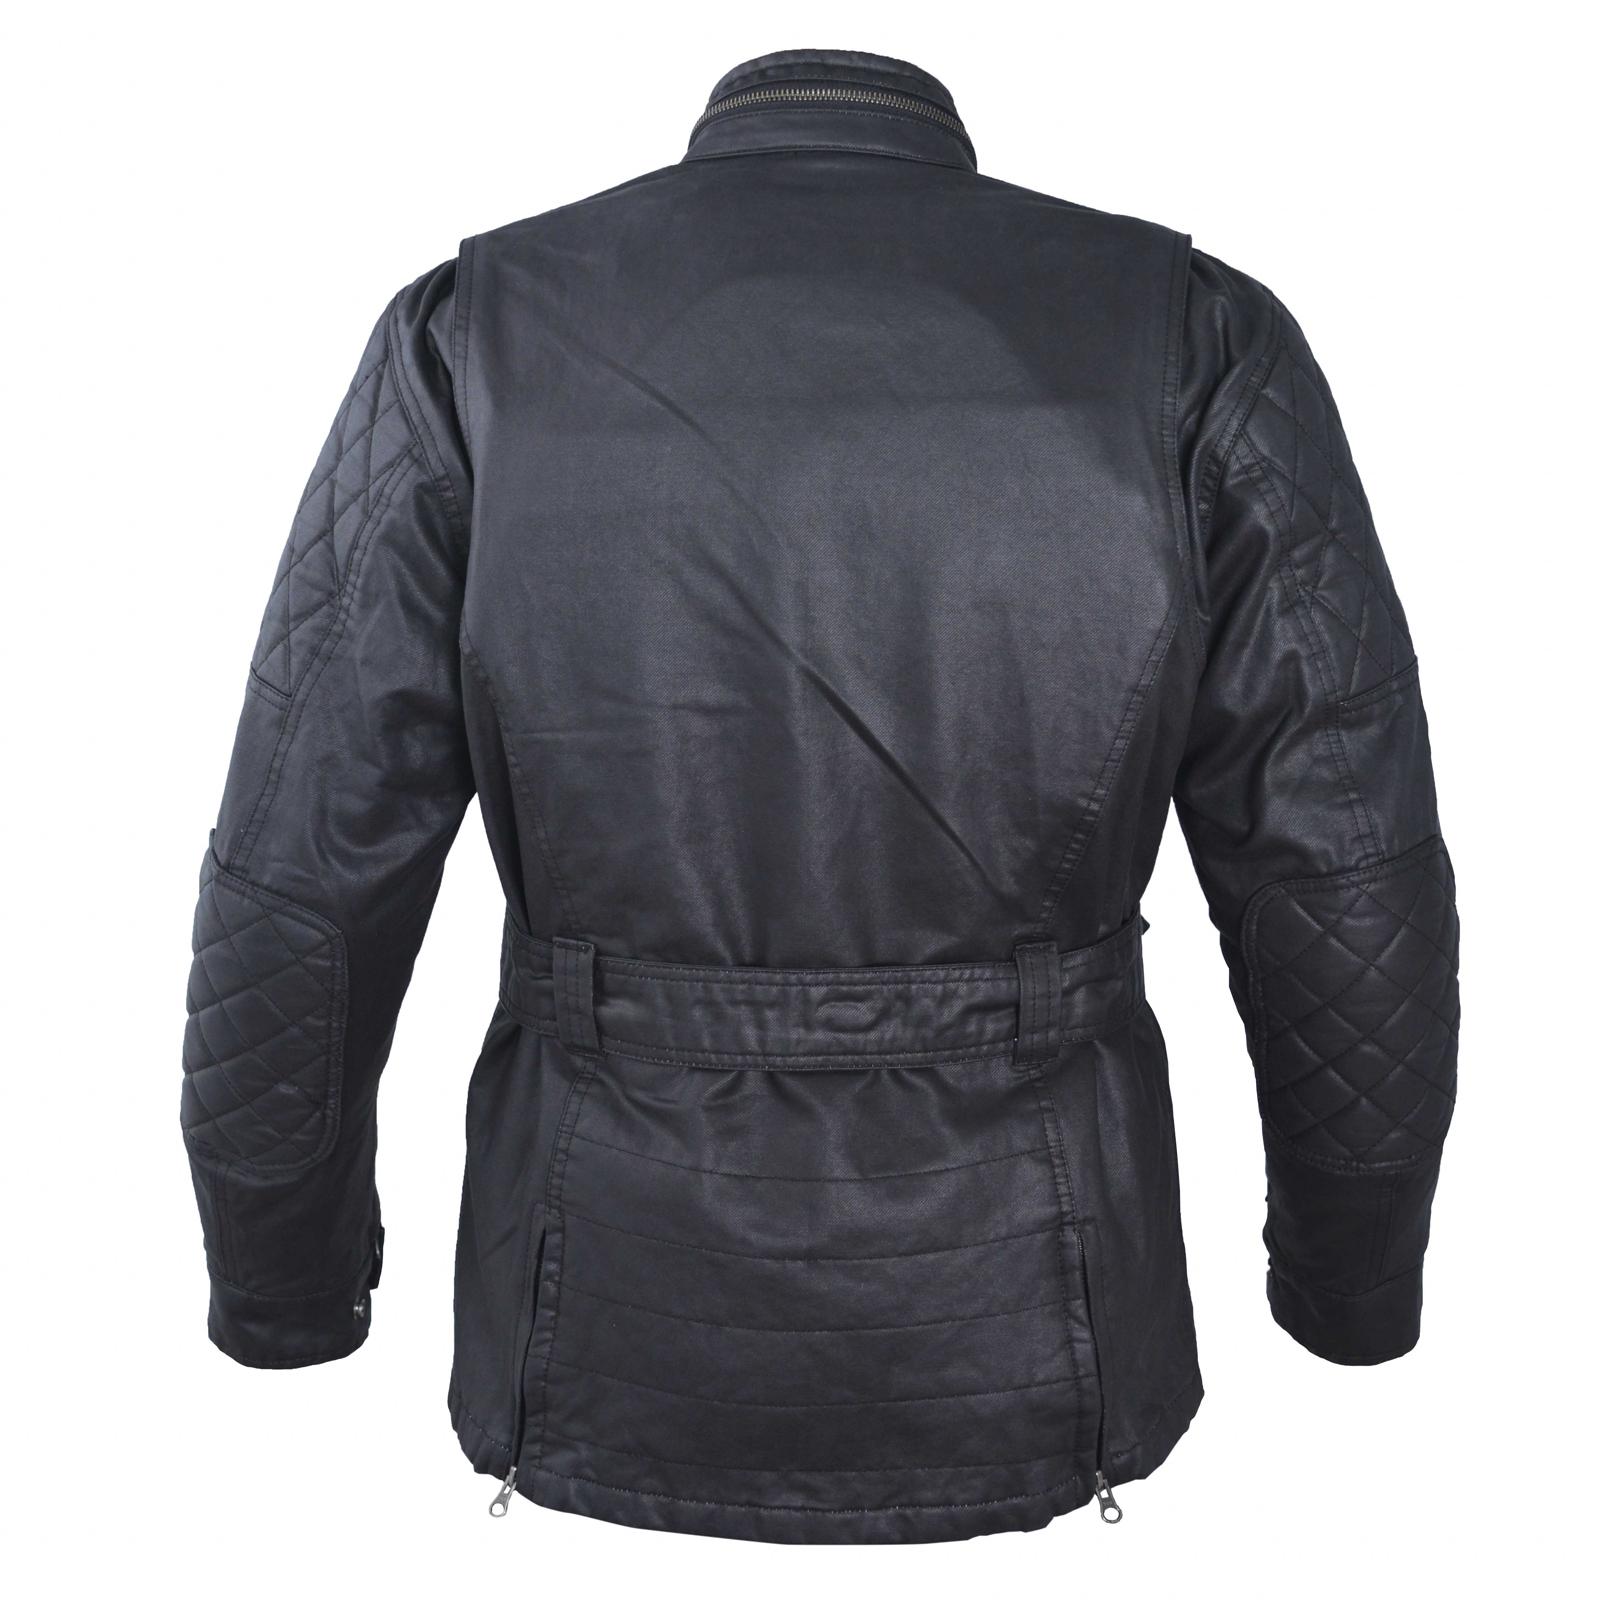 textile blouson femme coton cir moto sport scooter protections noir ebay. Black Bedroom Furniture Sets. Home Design Ideas